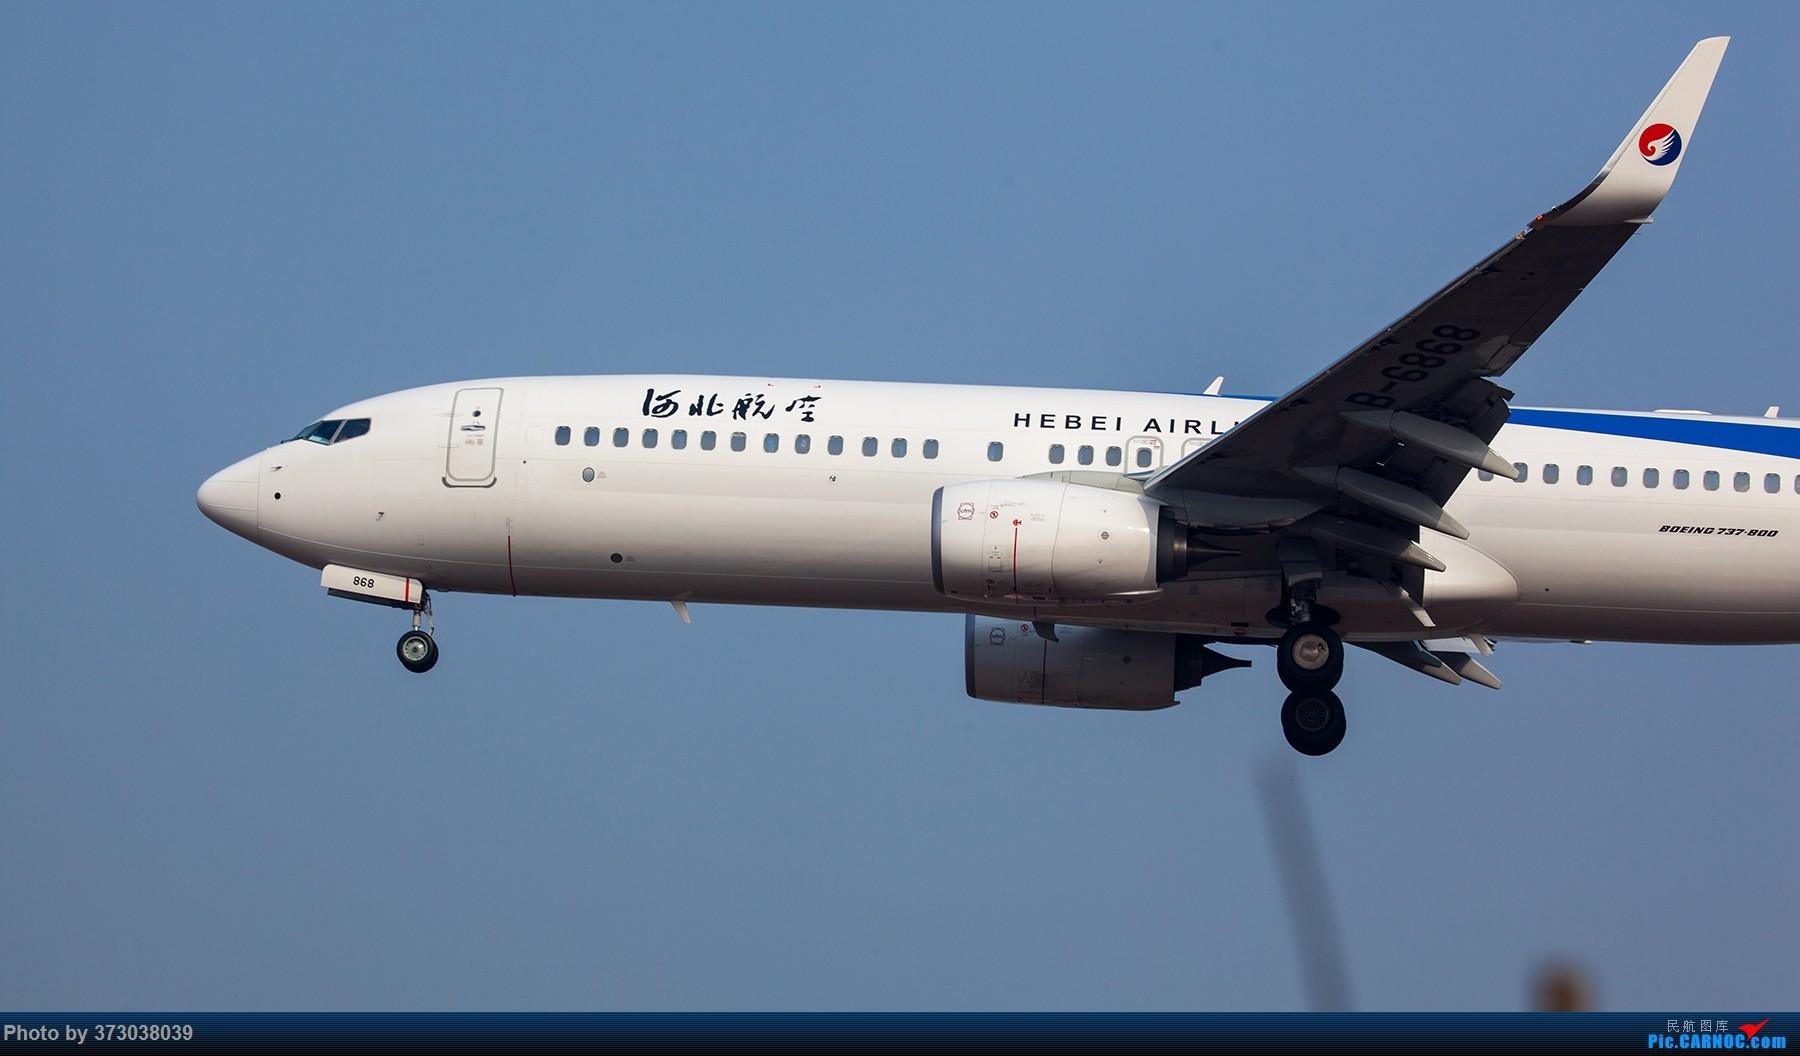 Re:[原创]【杭州飞友会】A320Neo迪士尼杭州萧山机场拍机班门弄斧记 BOEING 737-800 B-6868 中国杭州萧山国际机场